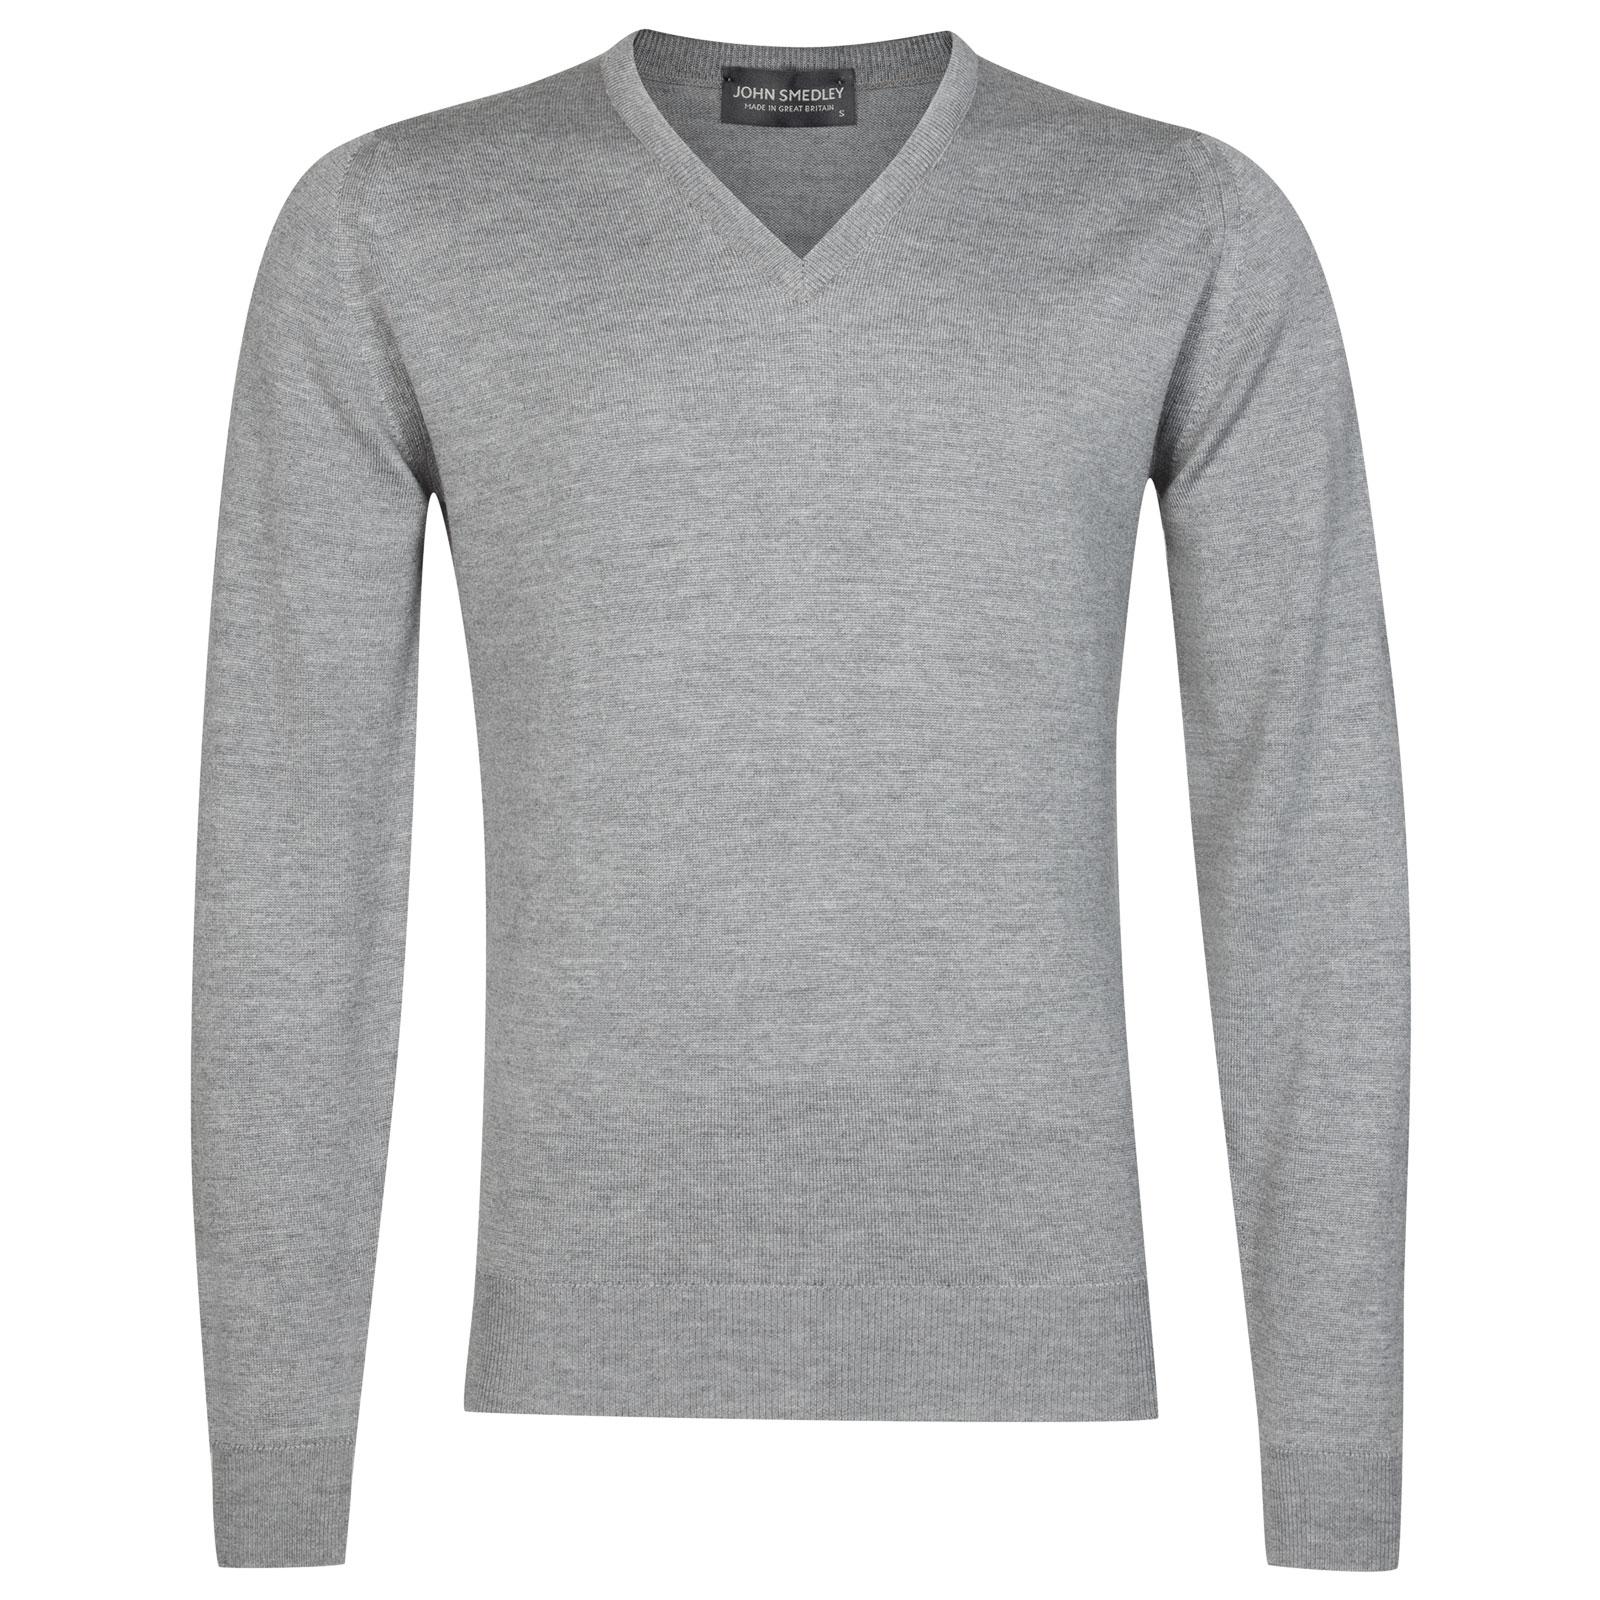 John Smedley Riber Merino Wool Pullover in Silver-S